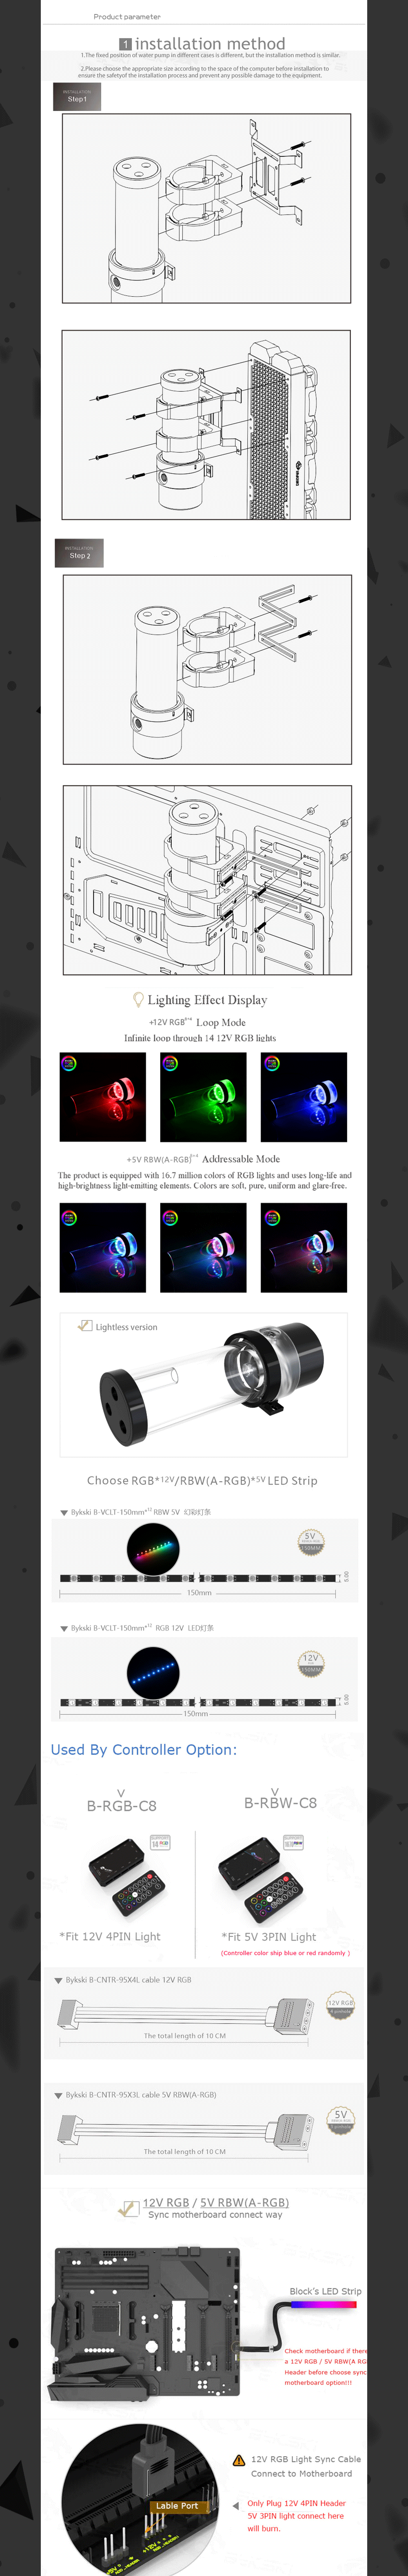 Bykski Ddc Series Pump Reserovir Combination With Lighting Maximum Flow 400L / H Max Lift 3 Meter For Computer Water Cooling